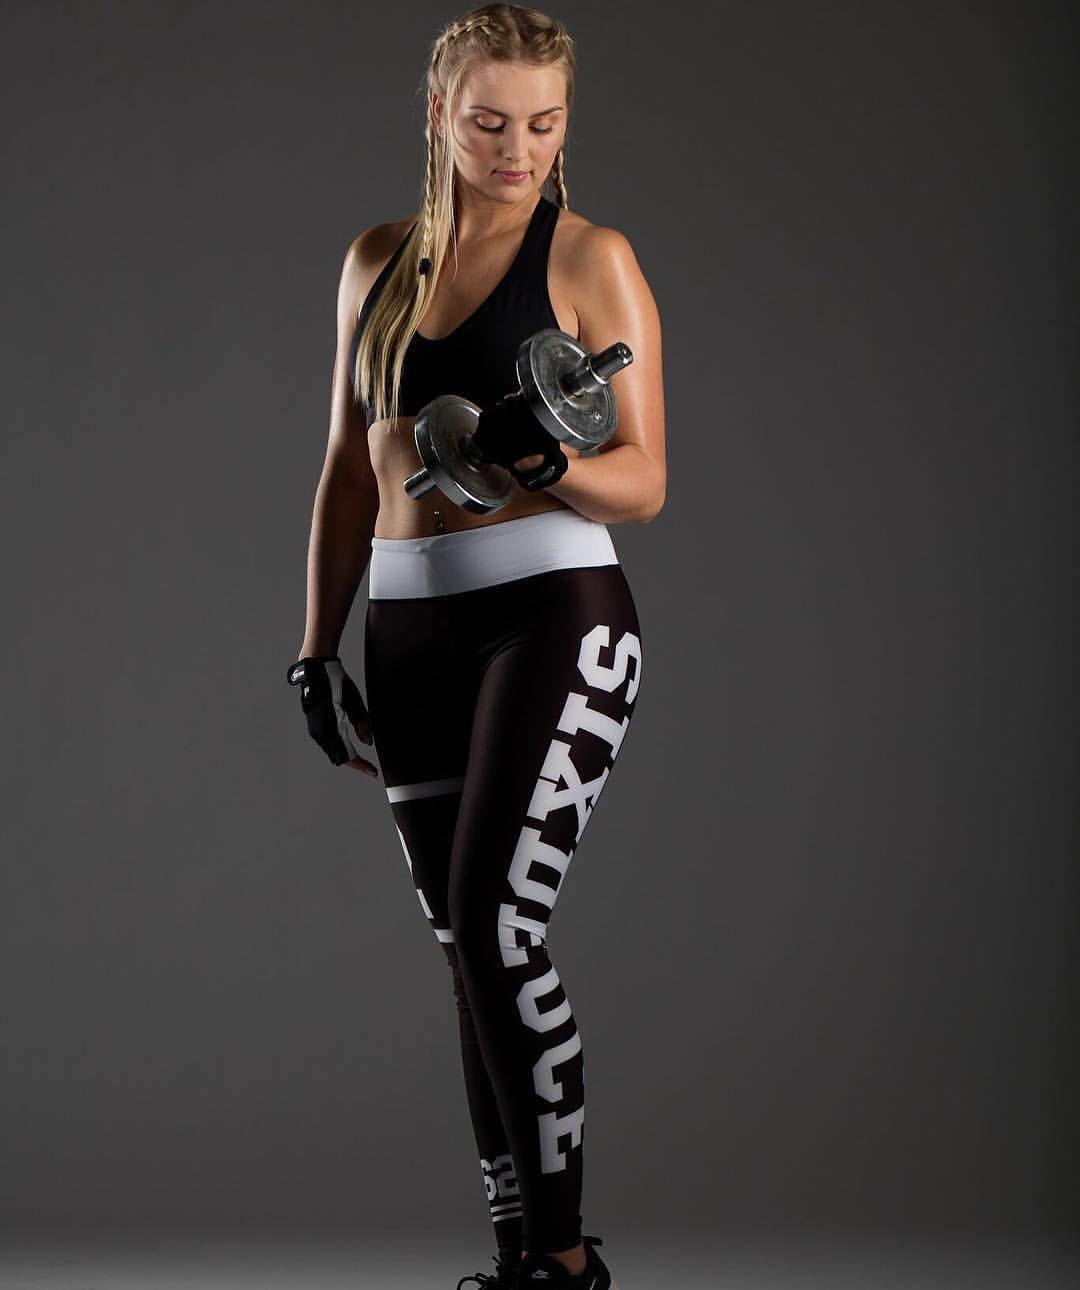 Fitness Franzi